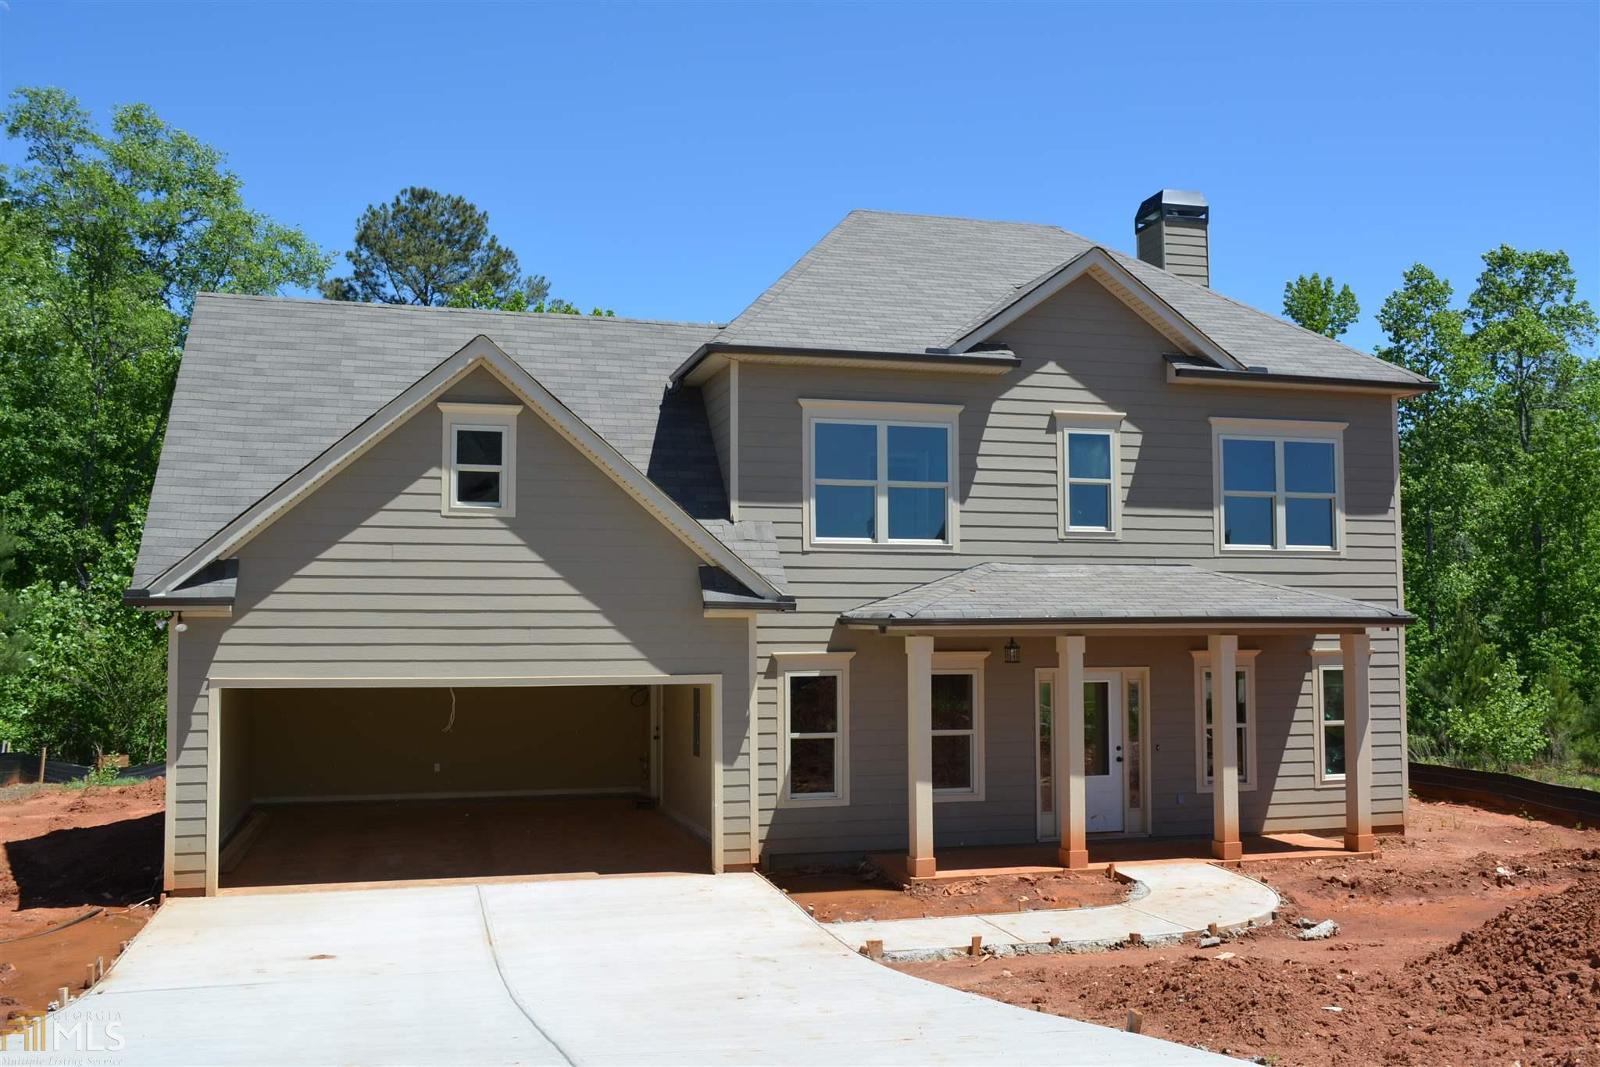 104 north pointe pkwy lagrange ga mls 8180153 for Home builders lagrange ga